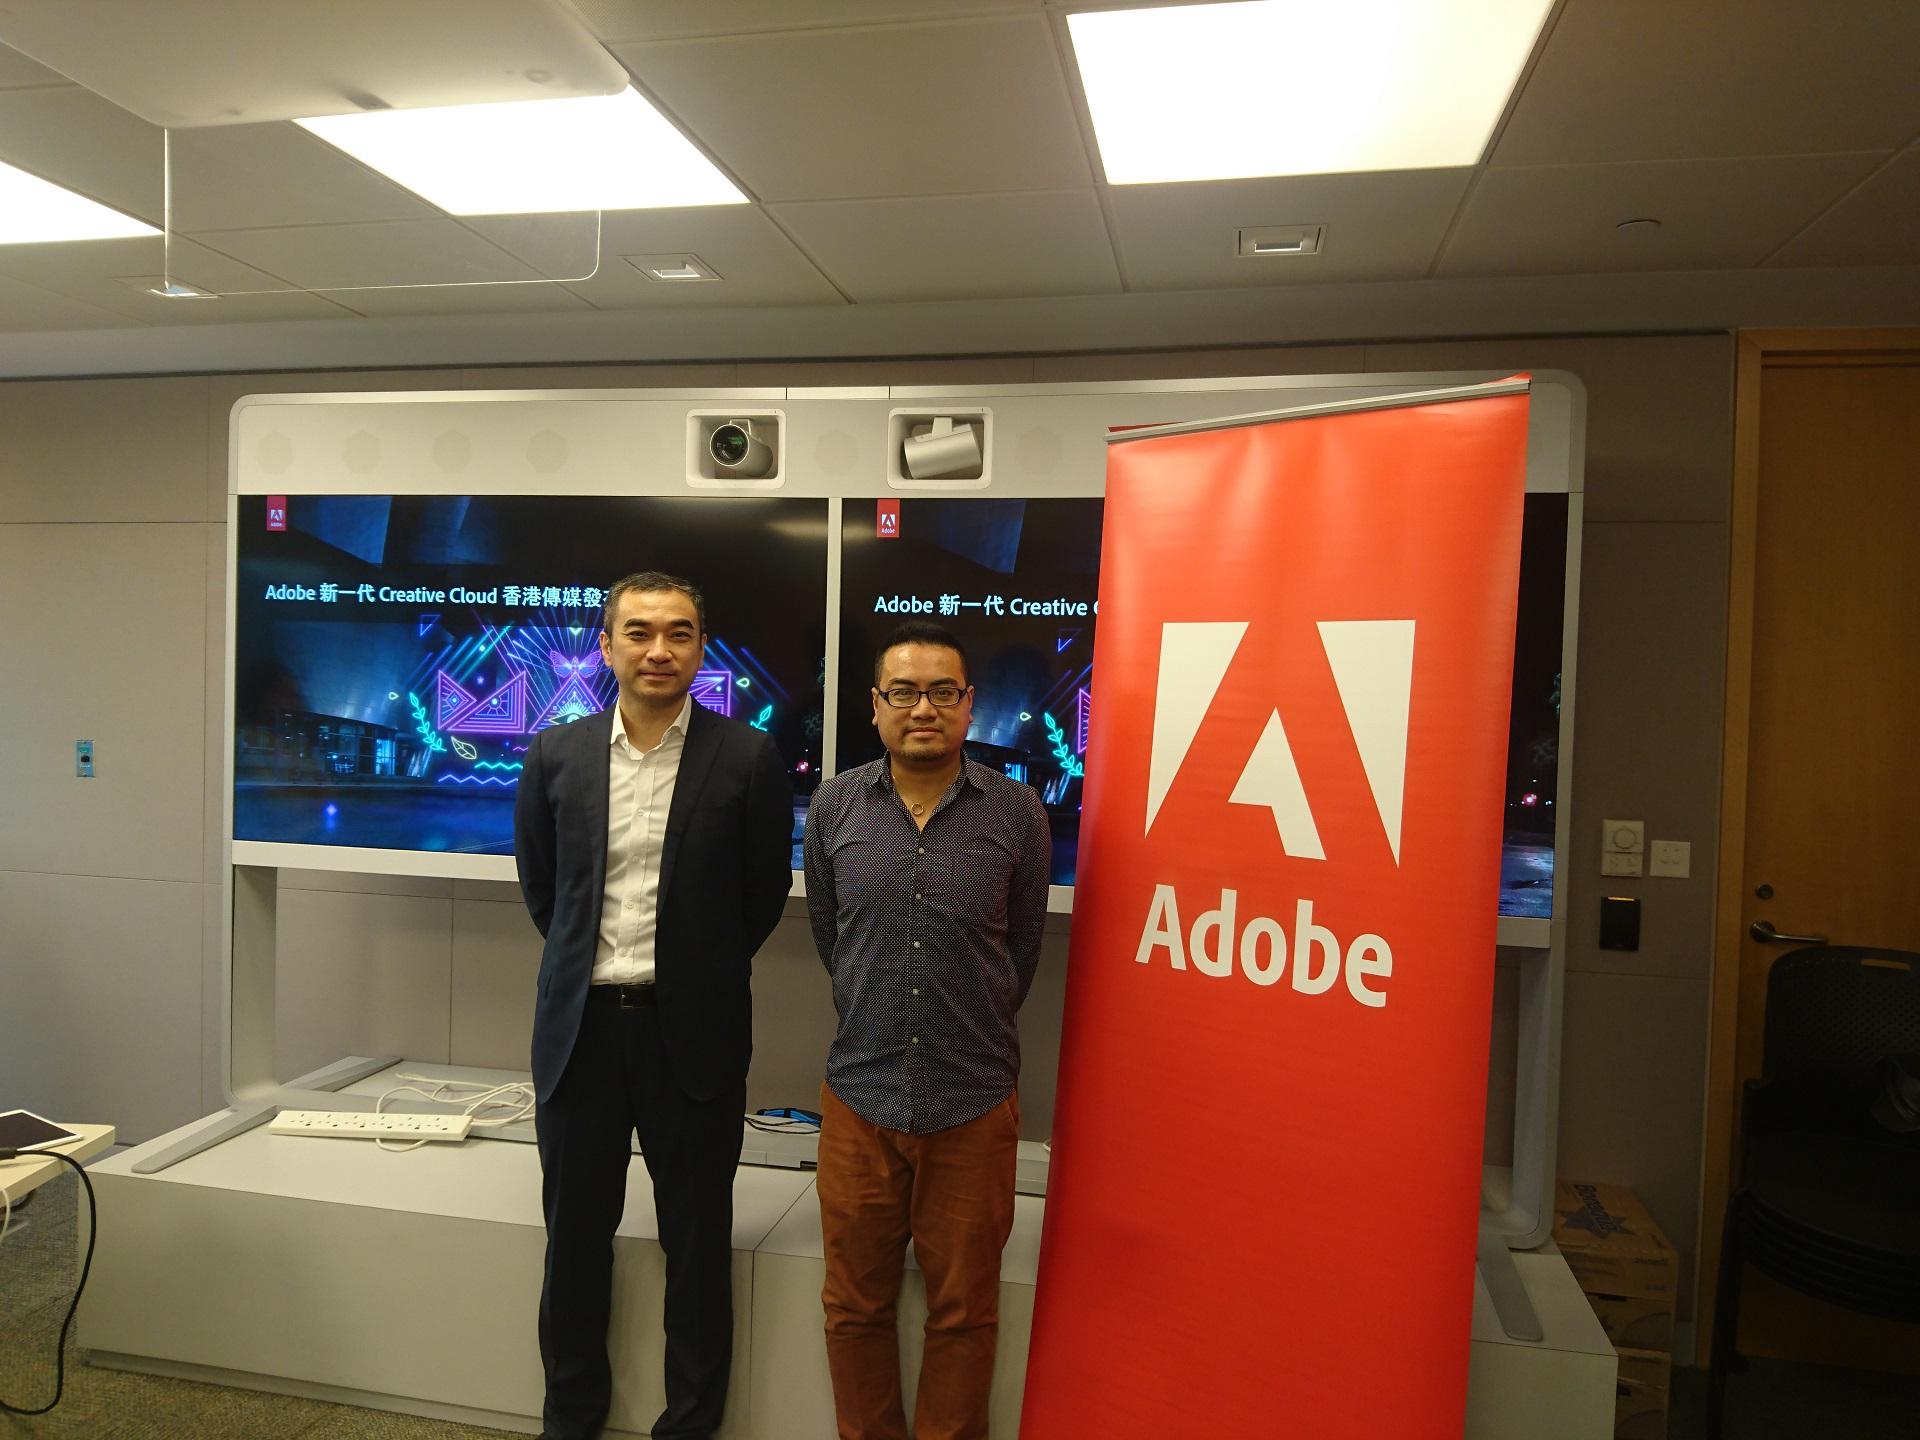 Adobe CC 2018 最新功能介紹 – XD、Photoshop、Premiere Rush 及更多